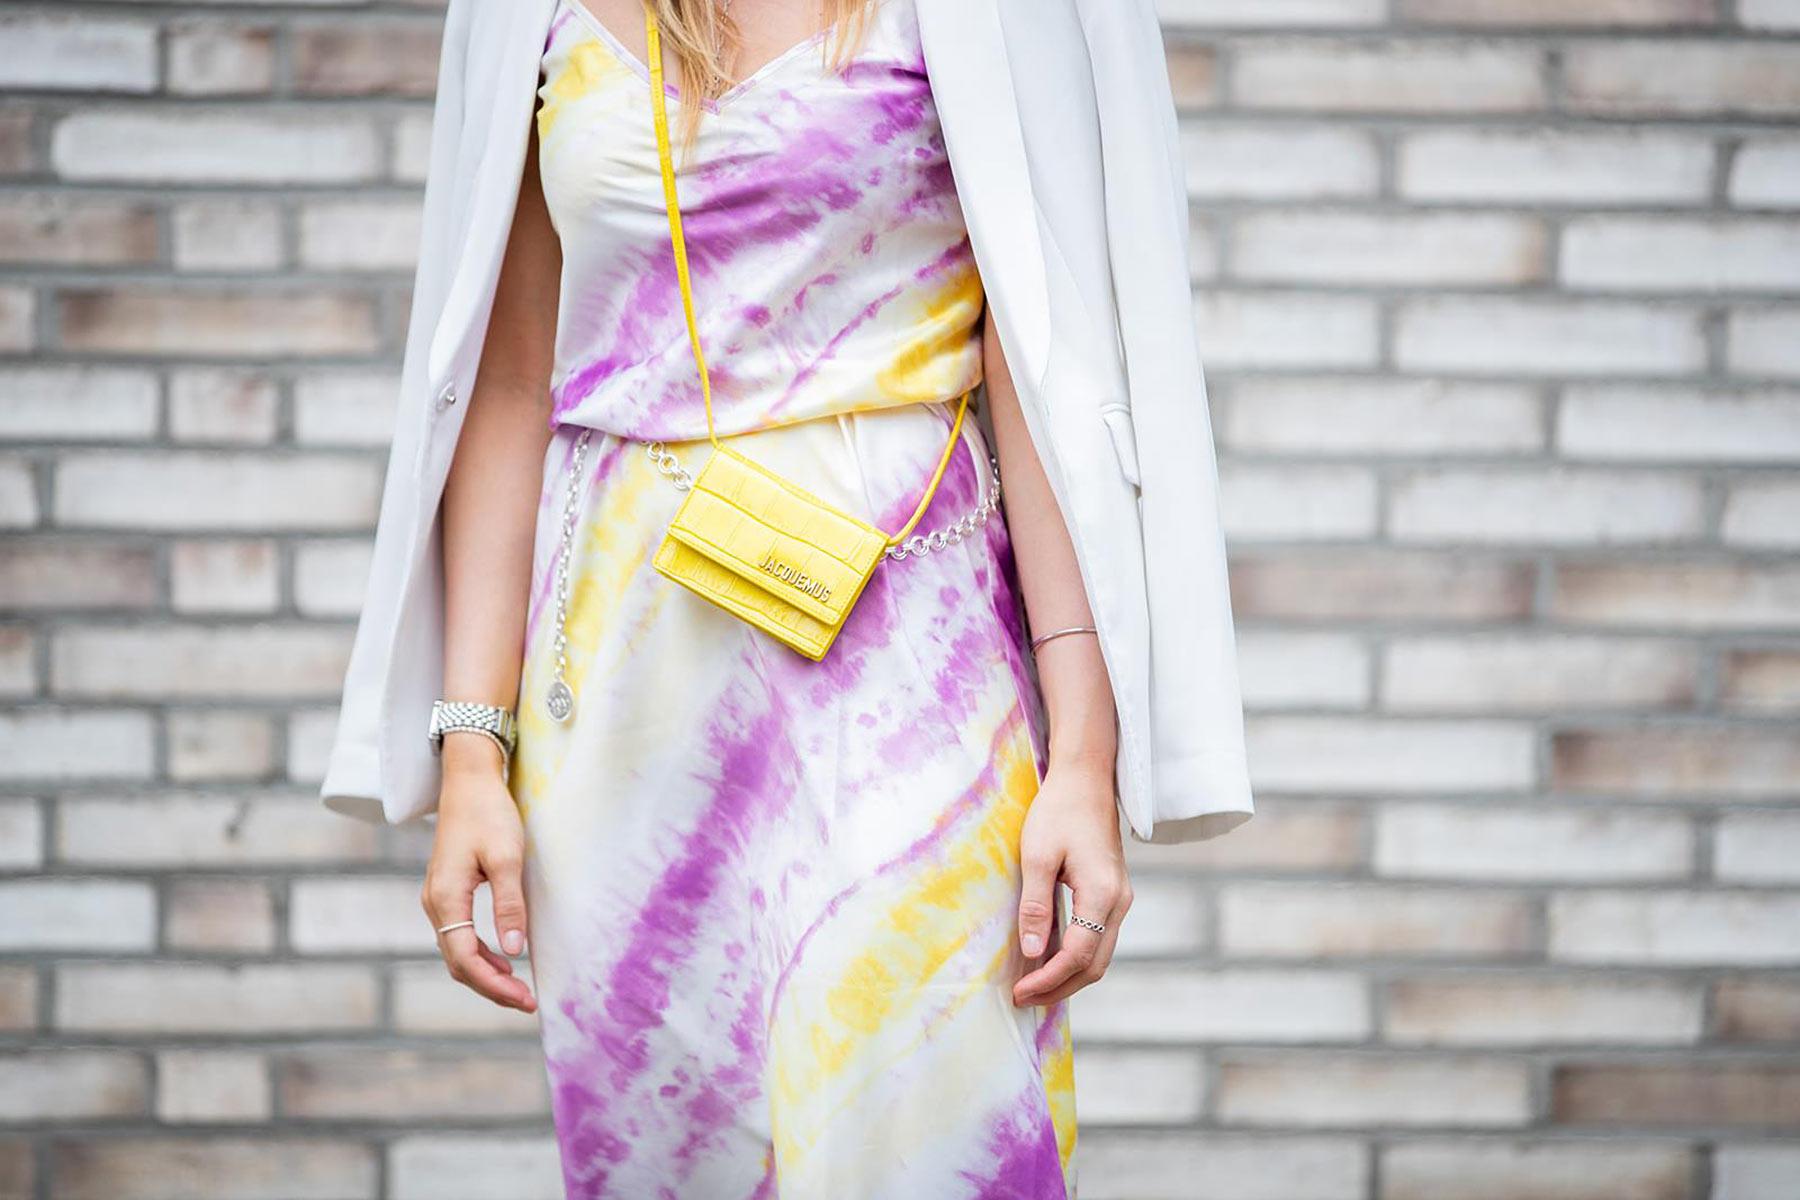 jacquemus tasche gelb le bello minibag fashion blogger inga brauer